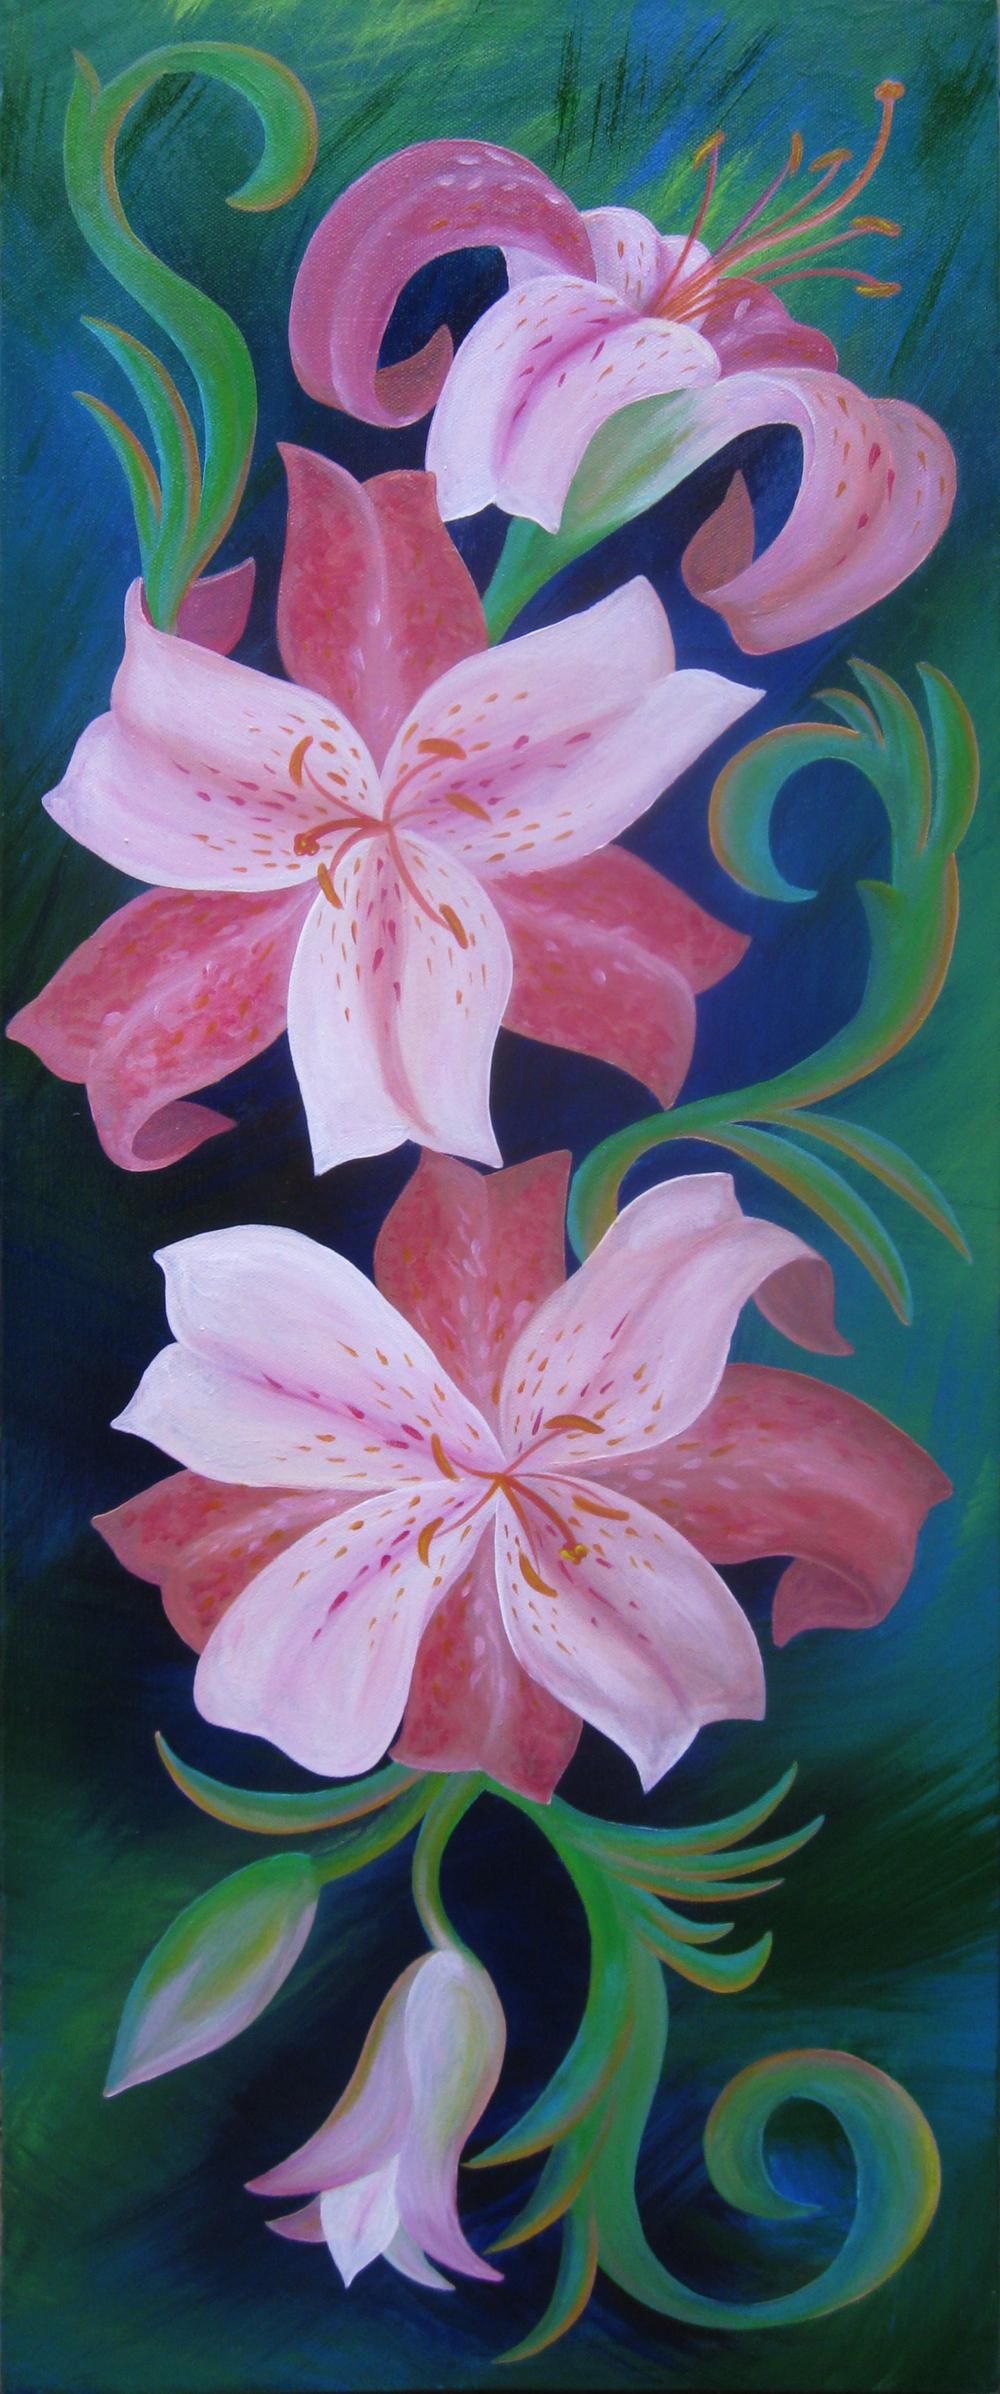 lilies 4x9.jpg